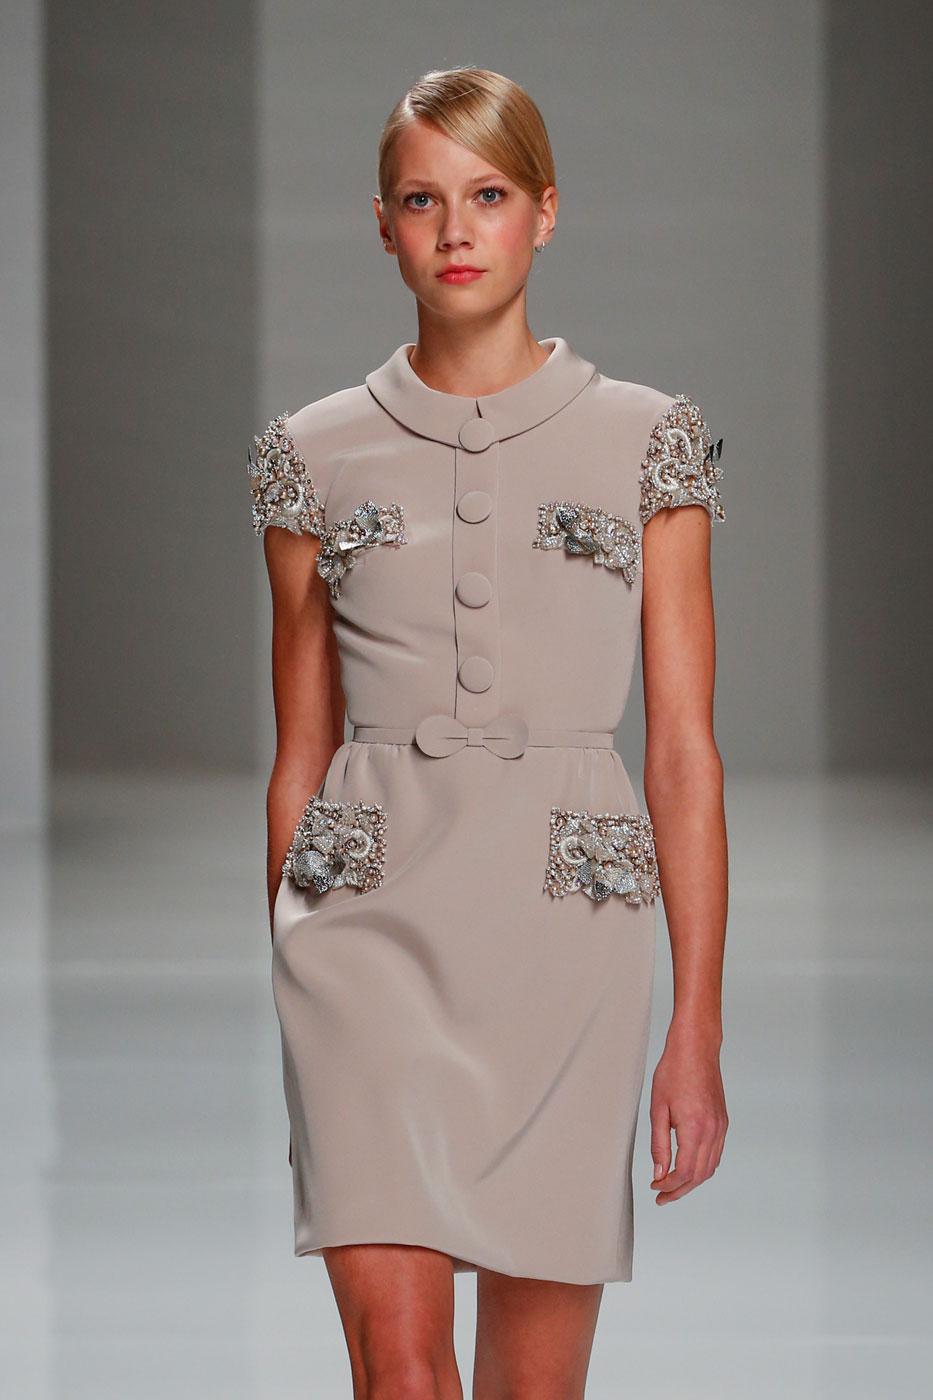 Georges-Hobeika-fashion-runway-show-haute-couture-paris-spring-2015-the-impression-34